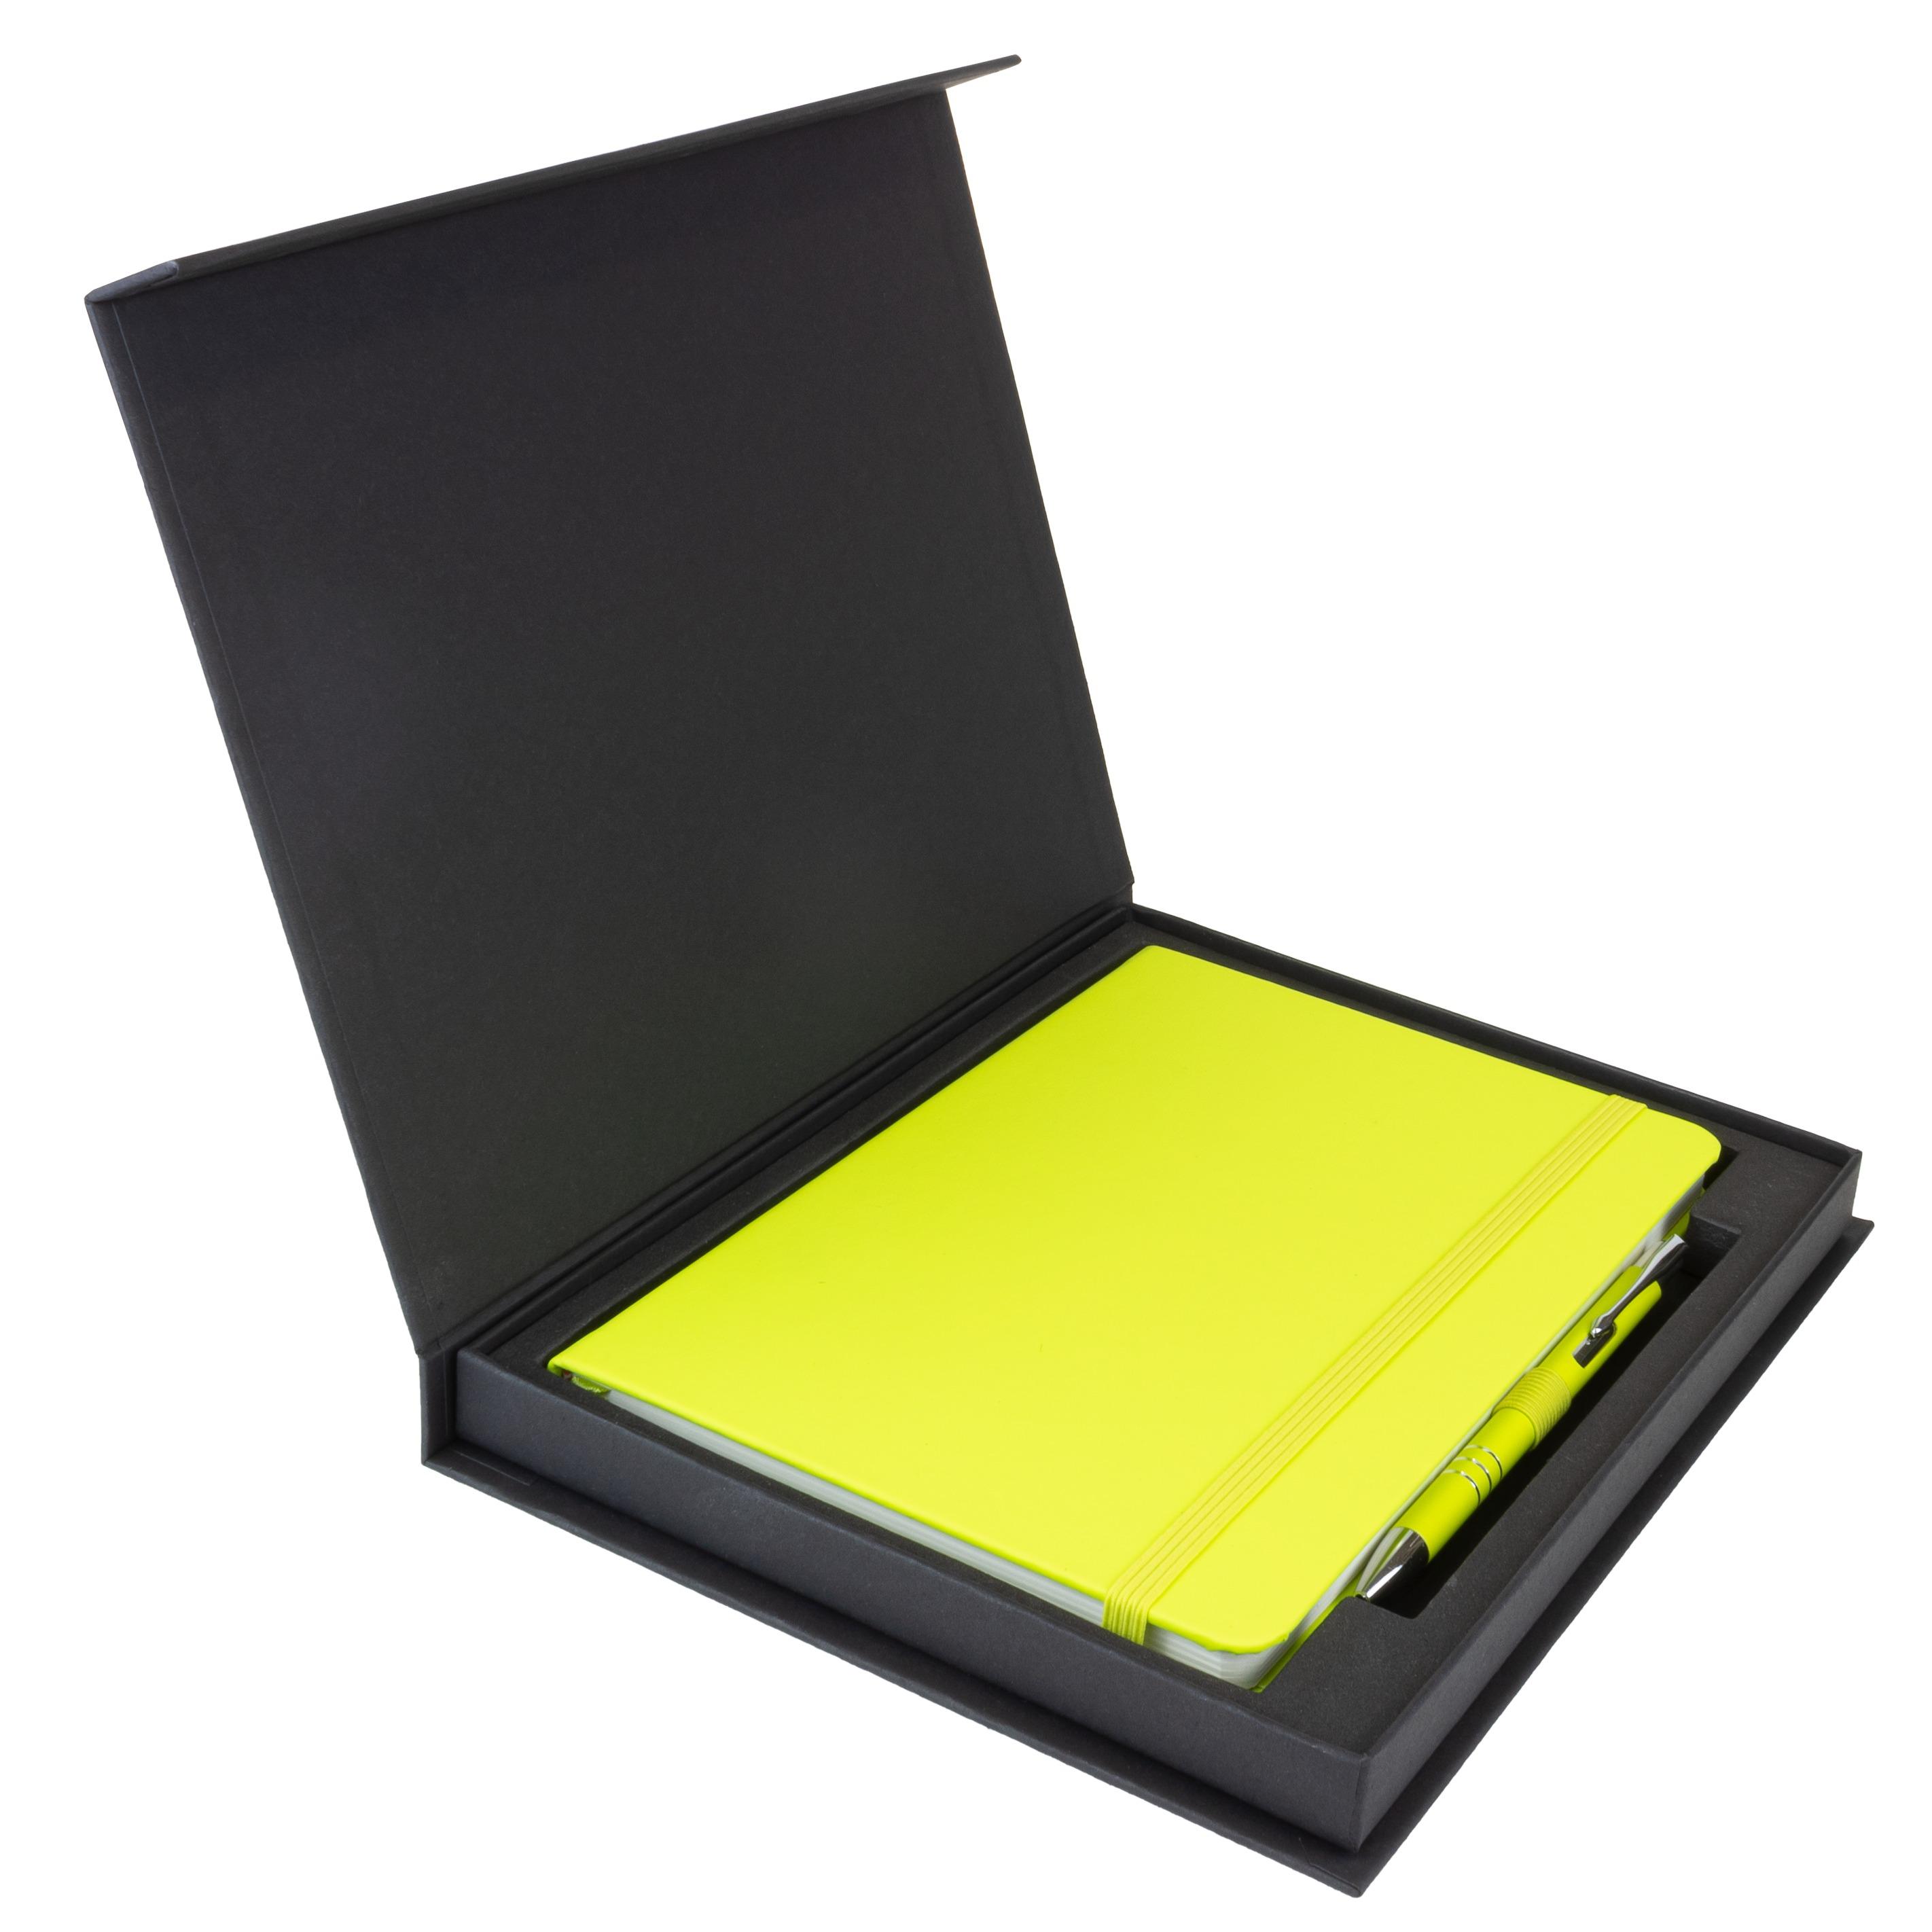 Box 1 Presentation Box Set